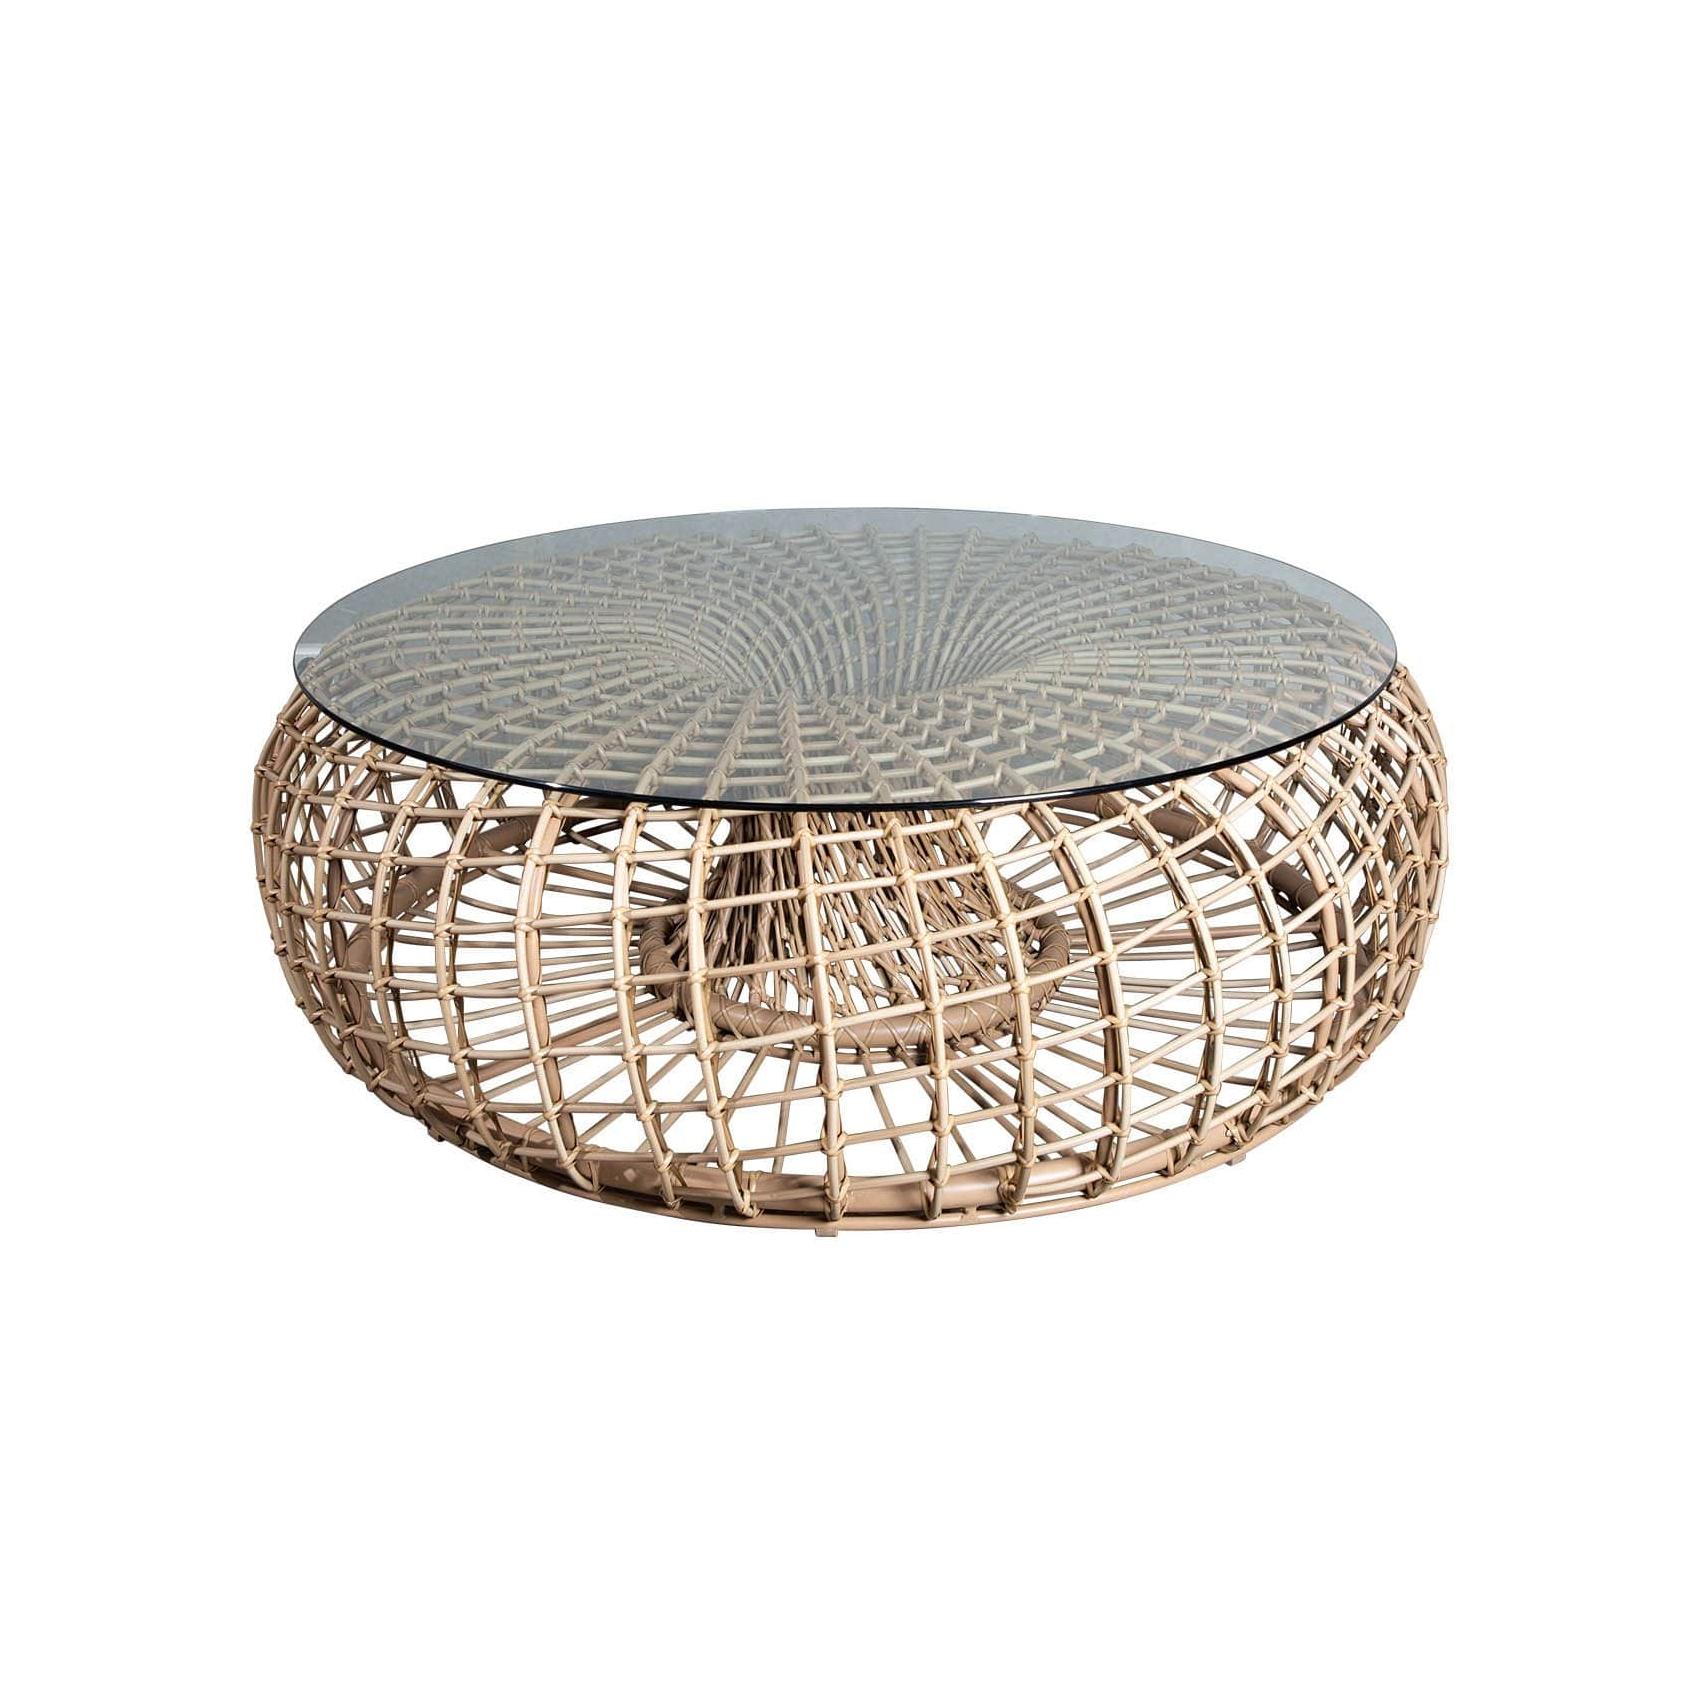 Nest OUTDOOR stort bord 130 cm Cane-line